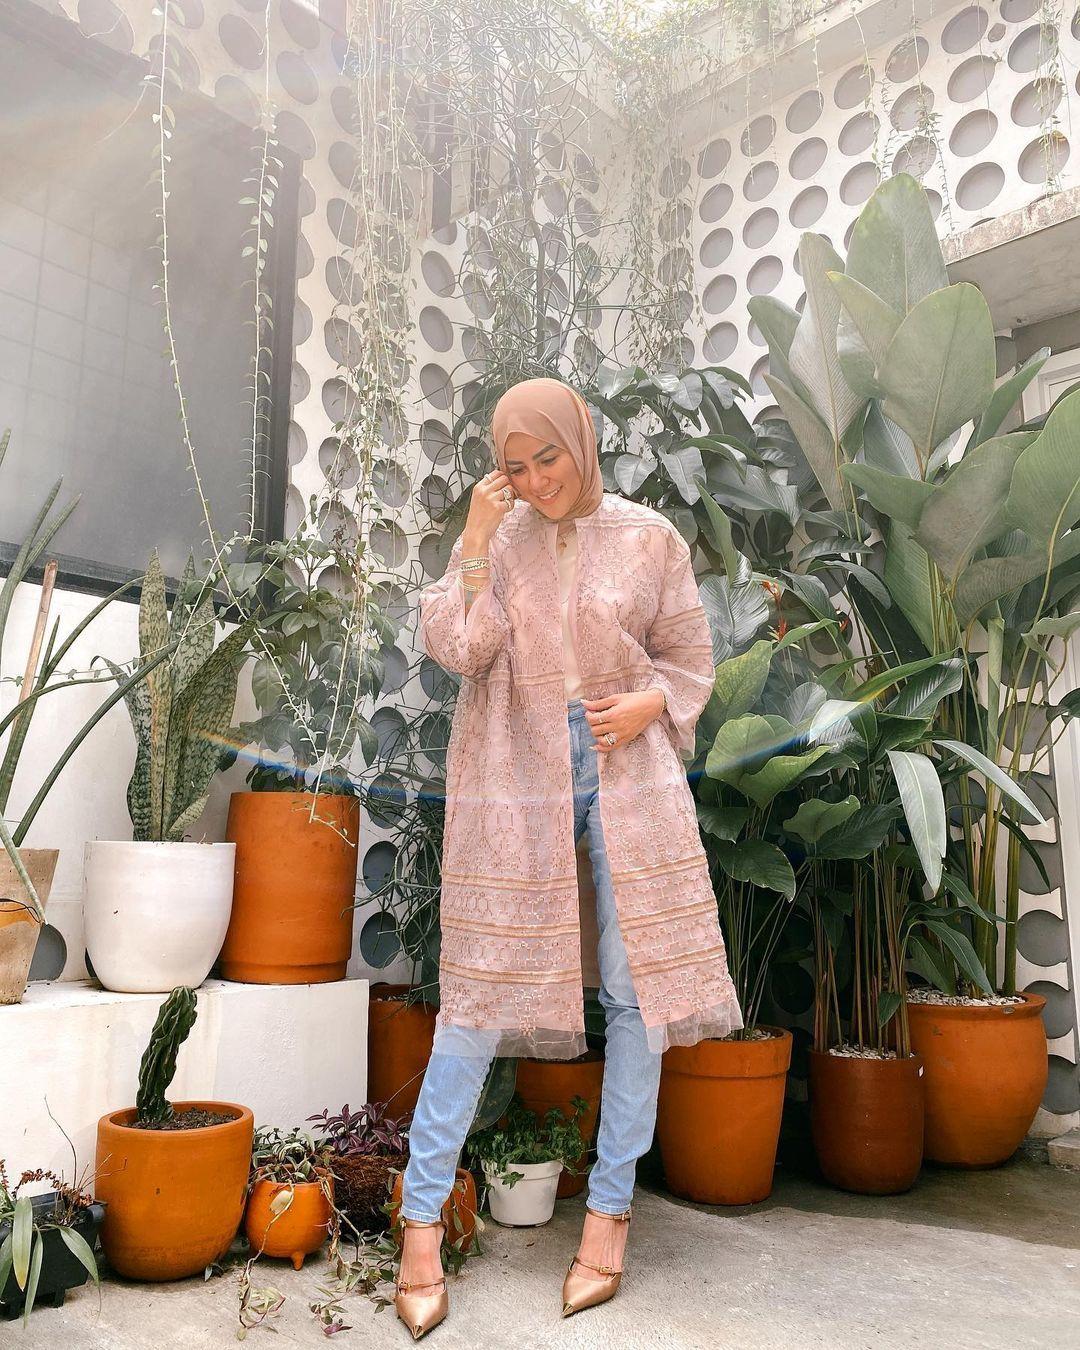 Sambut Hari Raya, Intip Inspirasi Baju Lebaran Para Artis